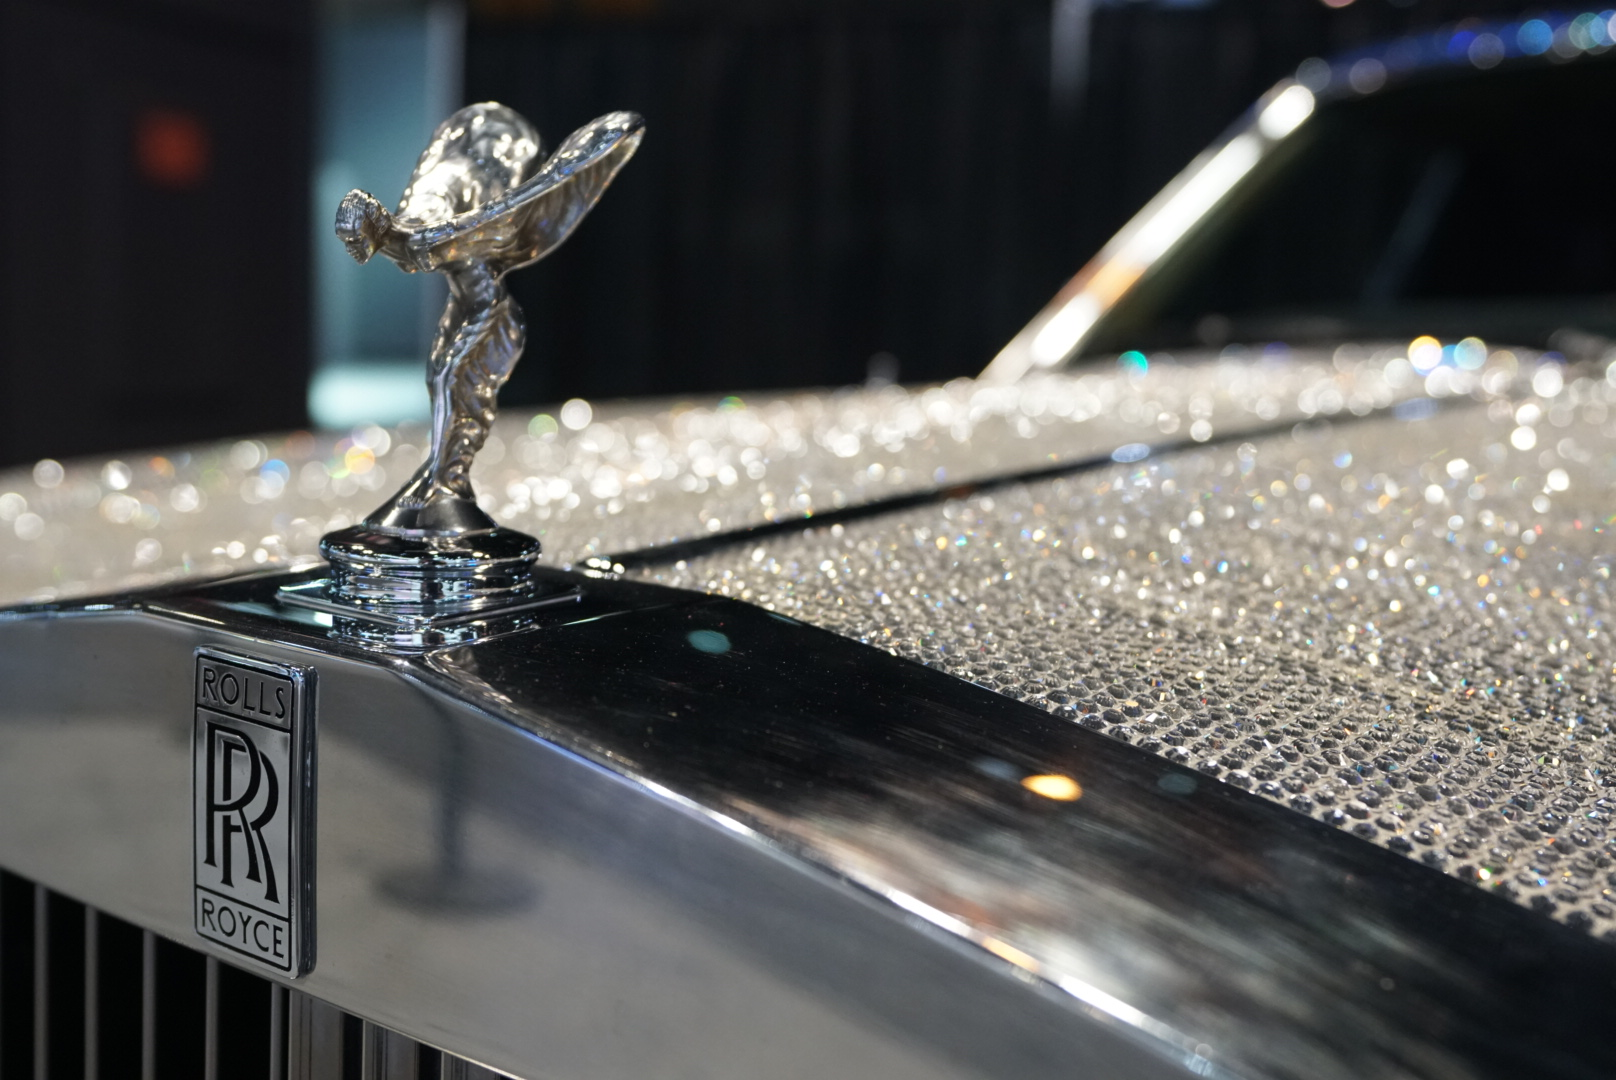 1983 Rolls-Royce Silver Spur hood emblem